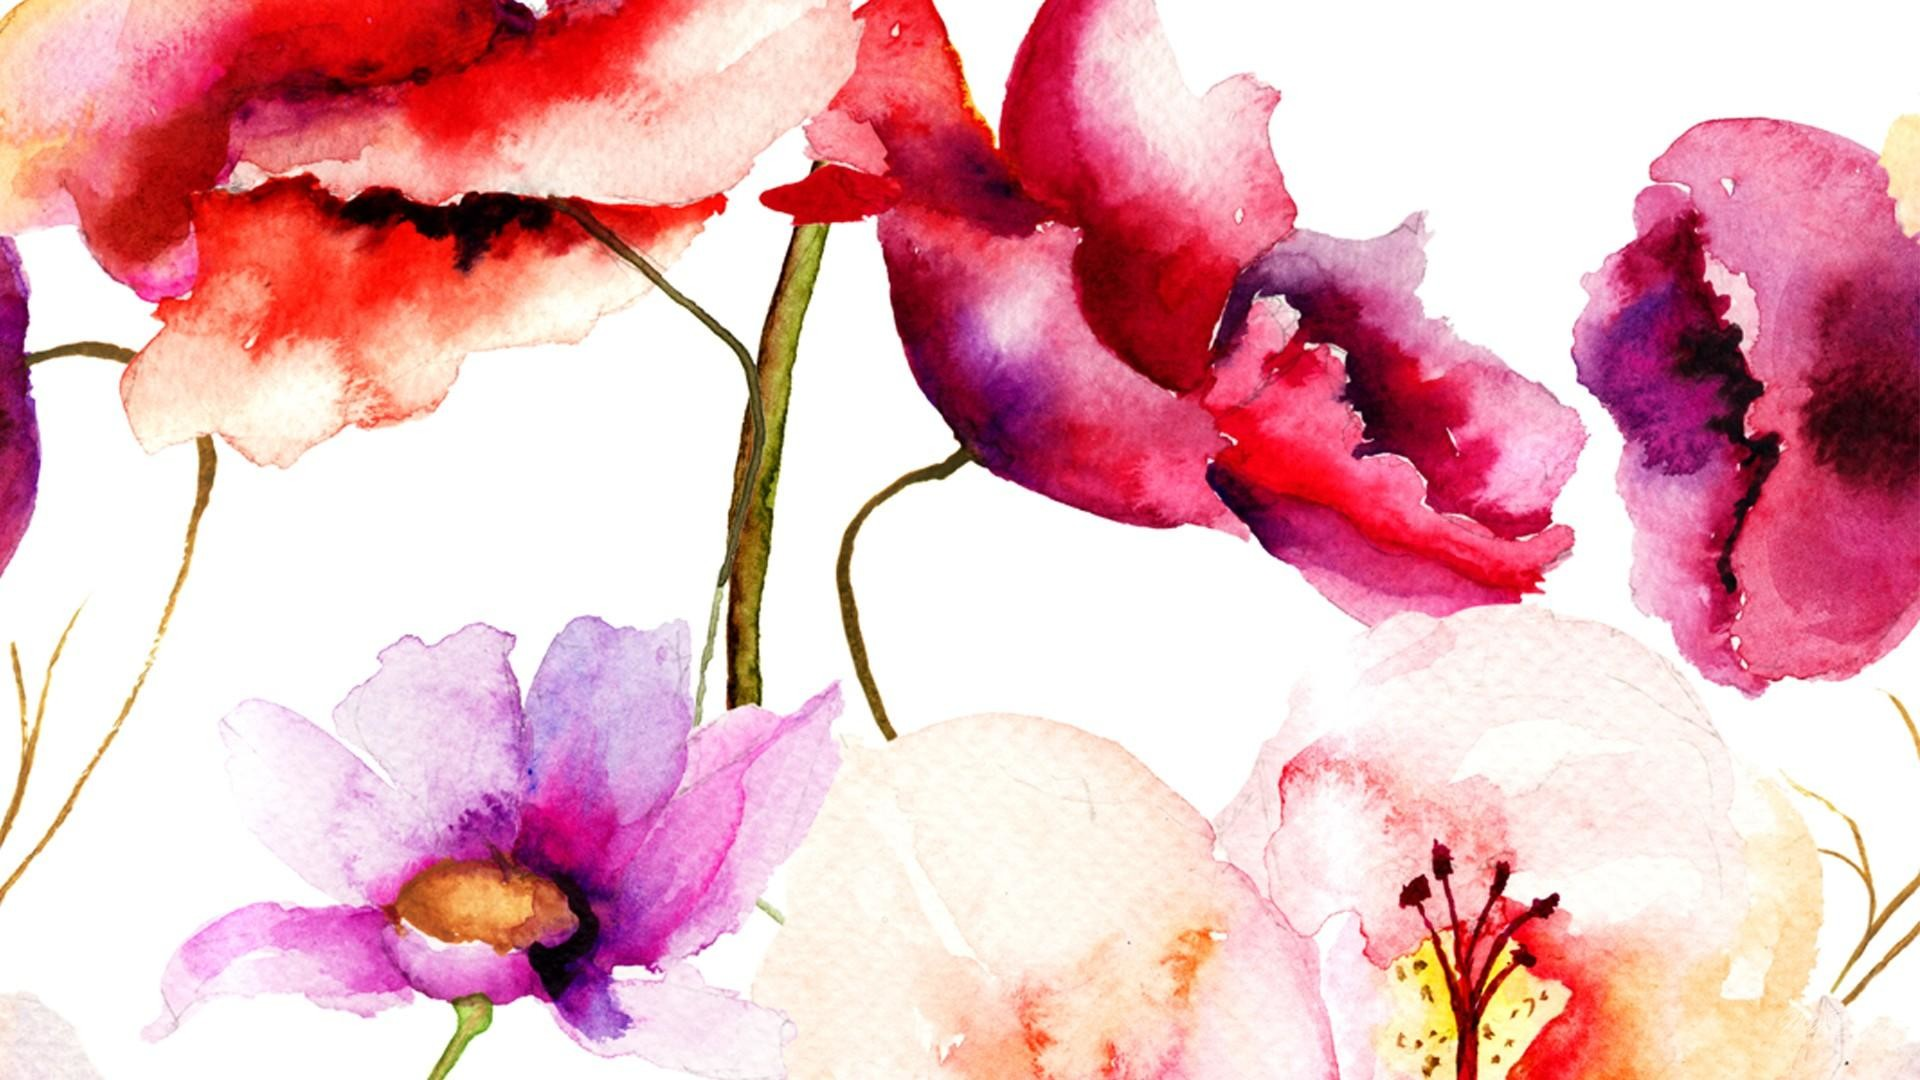 Flower Watercolor Wallpaper HD 14 High Resolution Wallpaper Full Size .